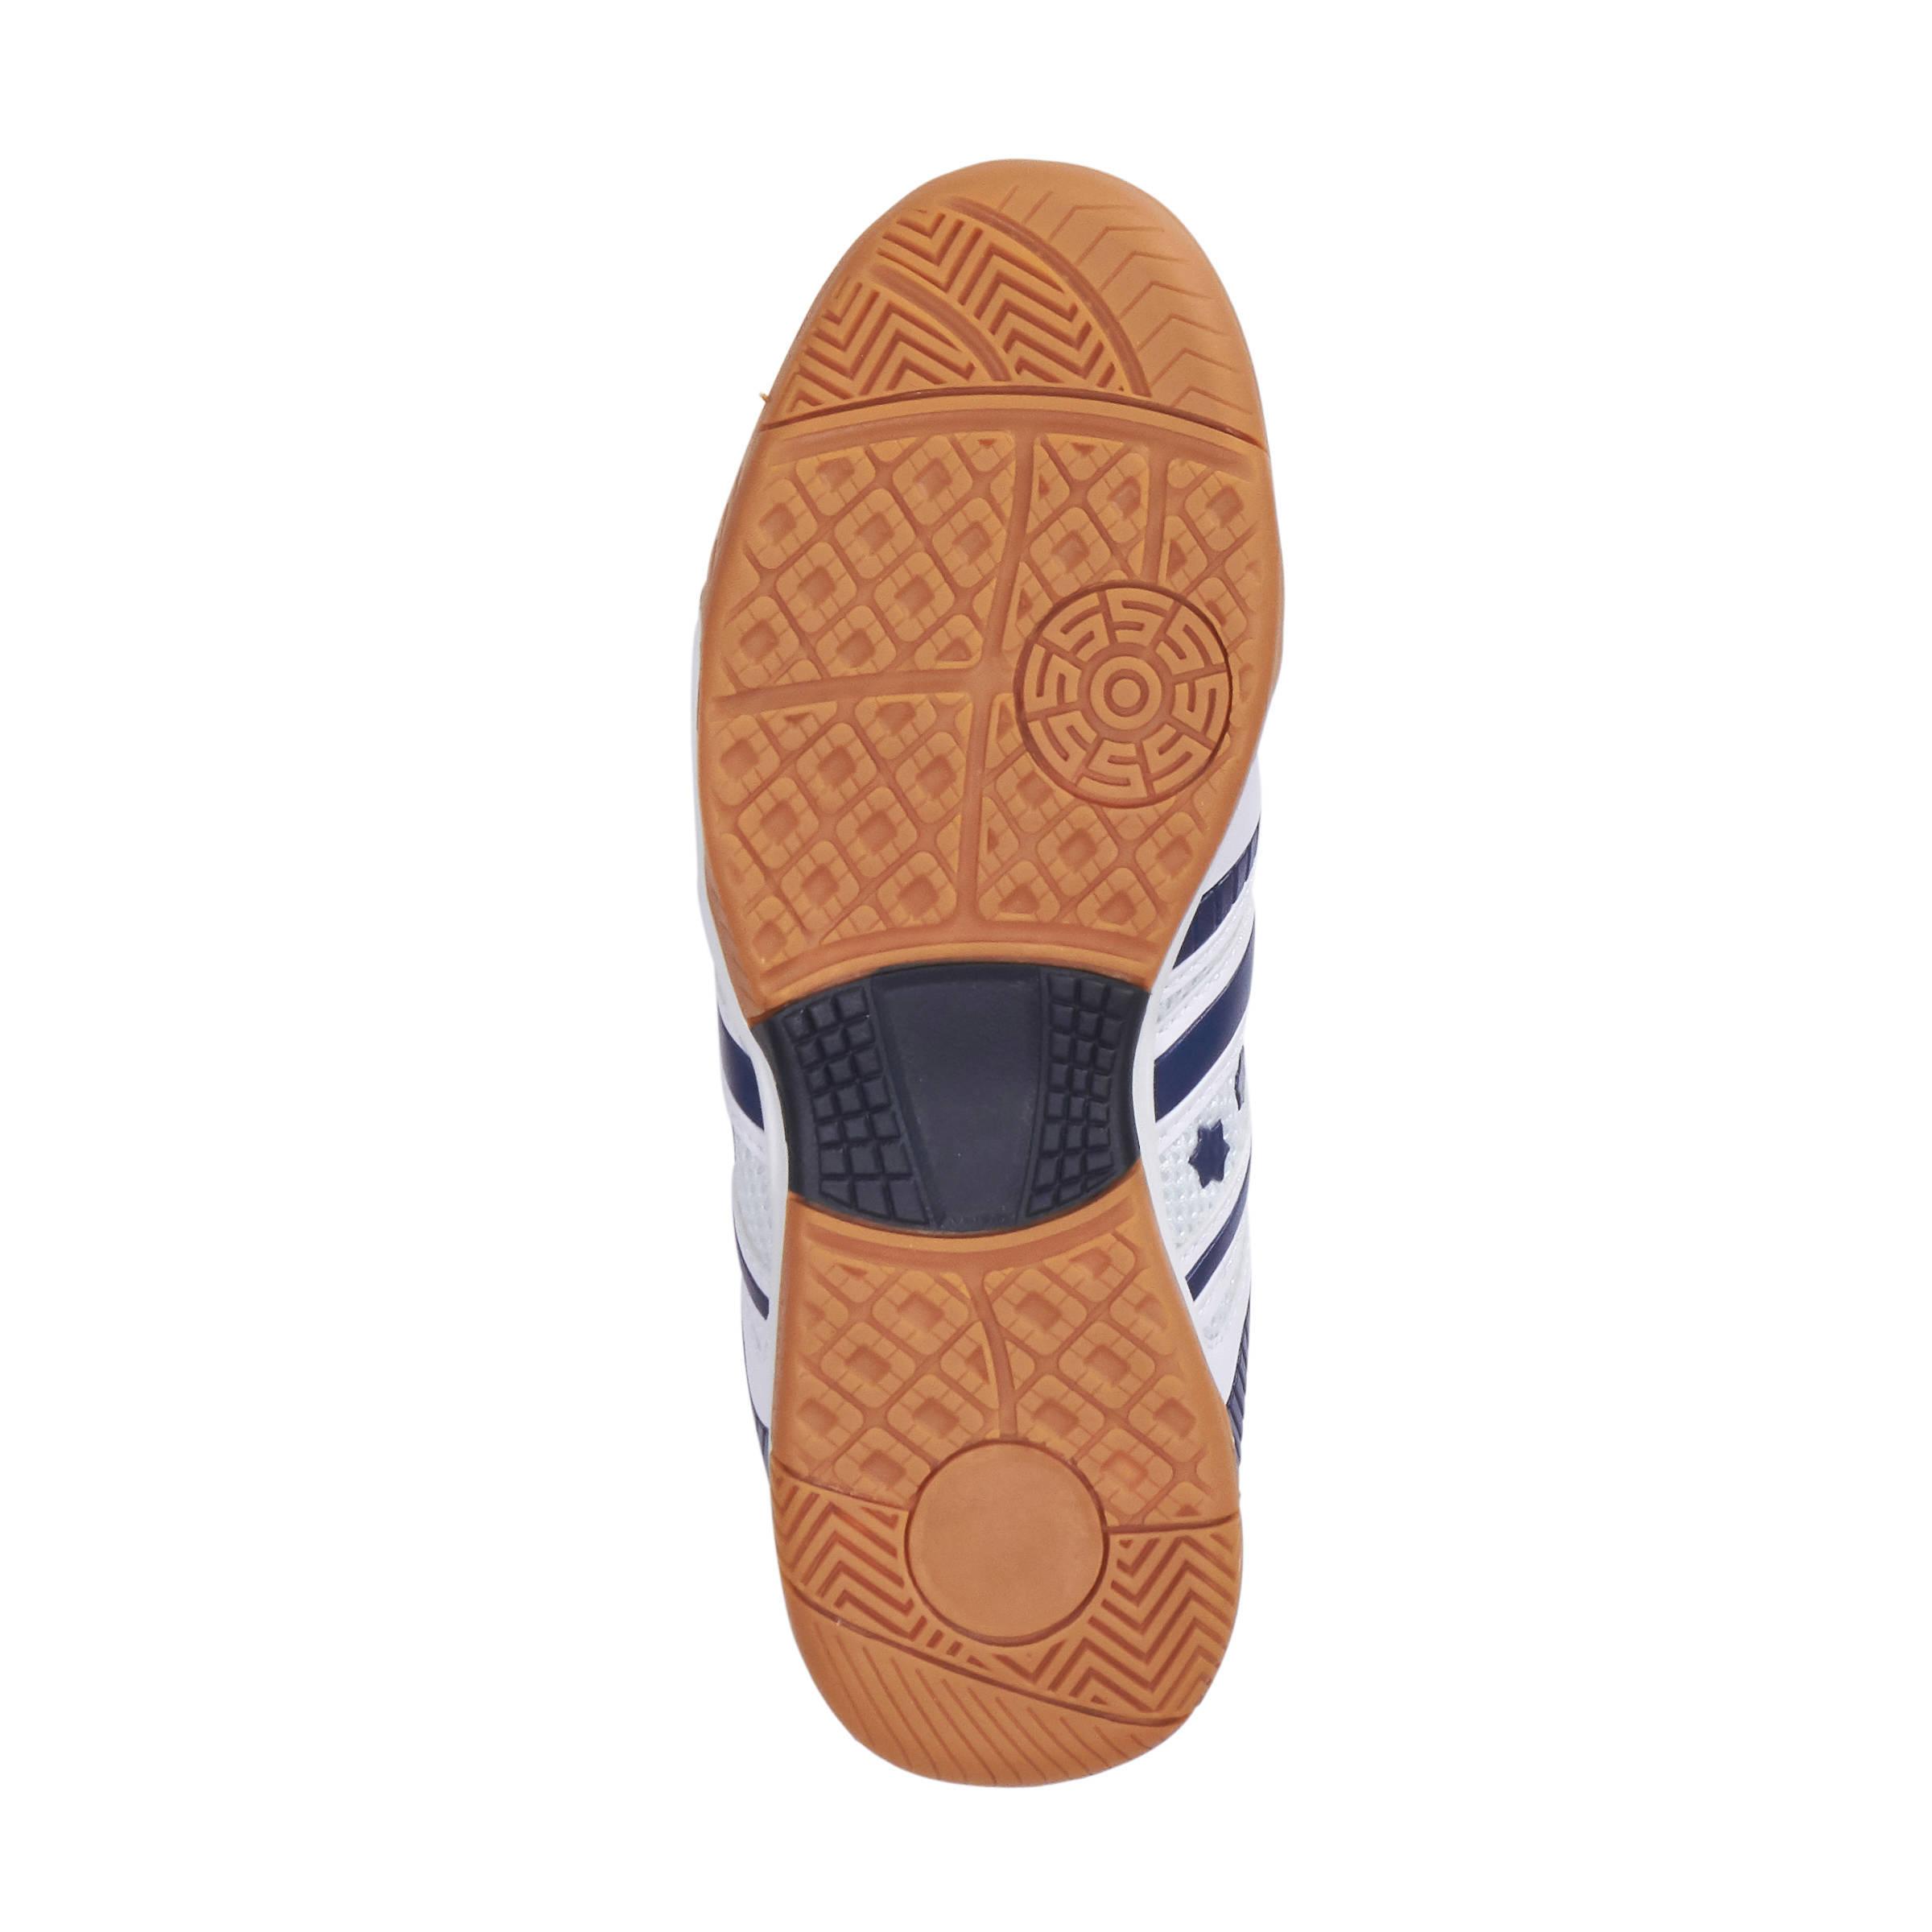 6294eaf3e69b8e rucanor-ultra-indoor-sportschoenen-wit-donkerblauw-wit-8715517606608.jpg